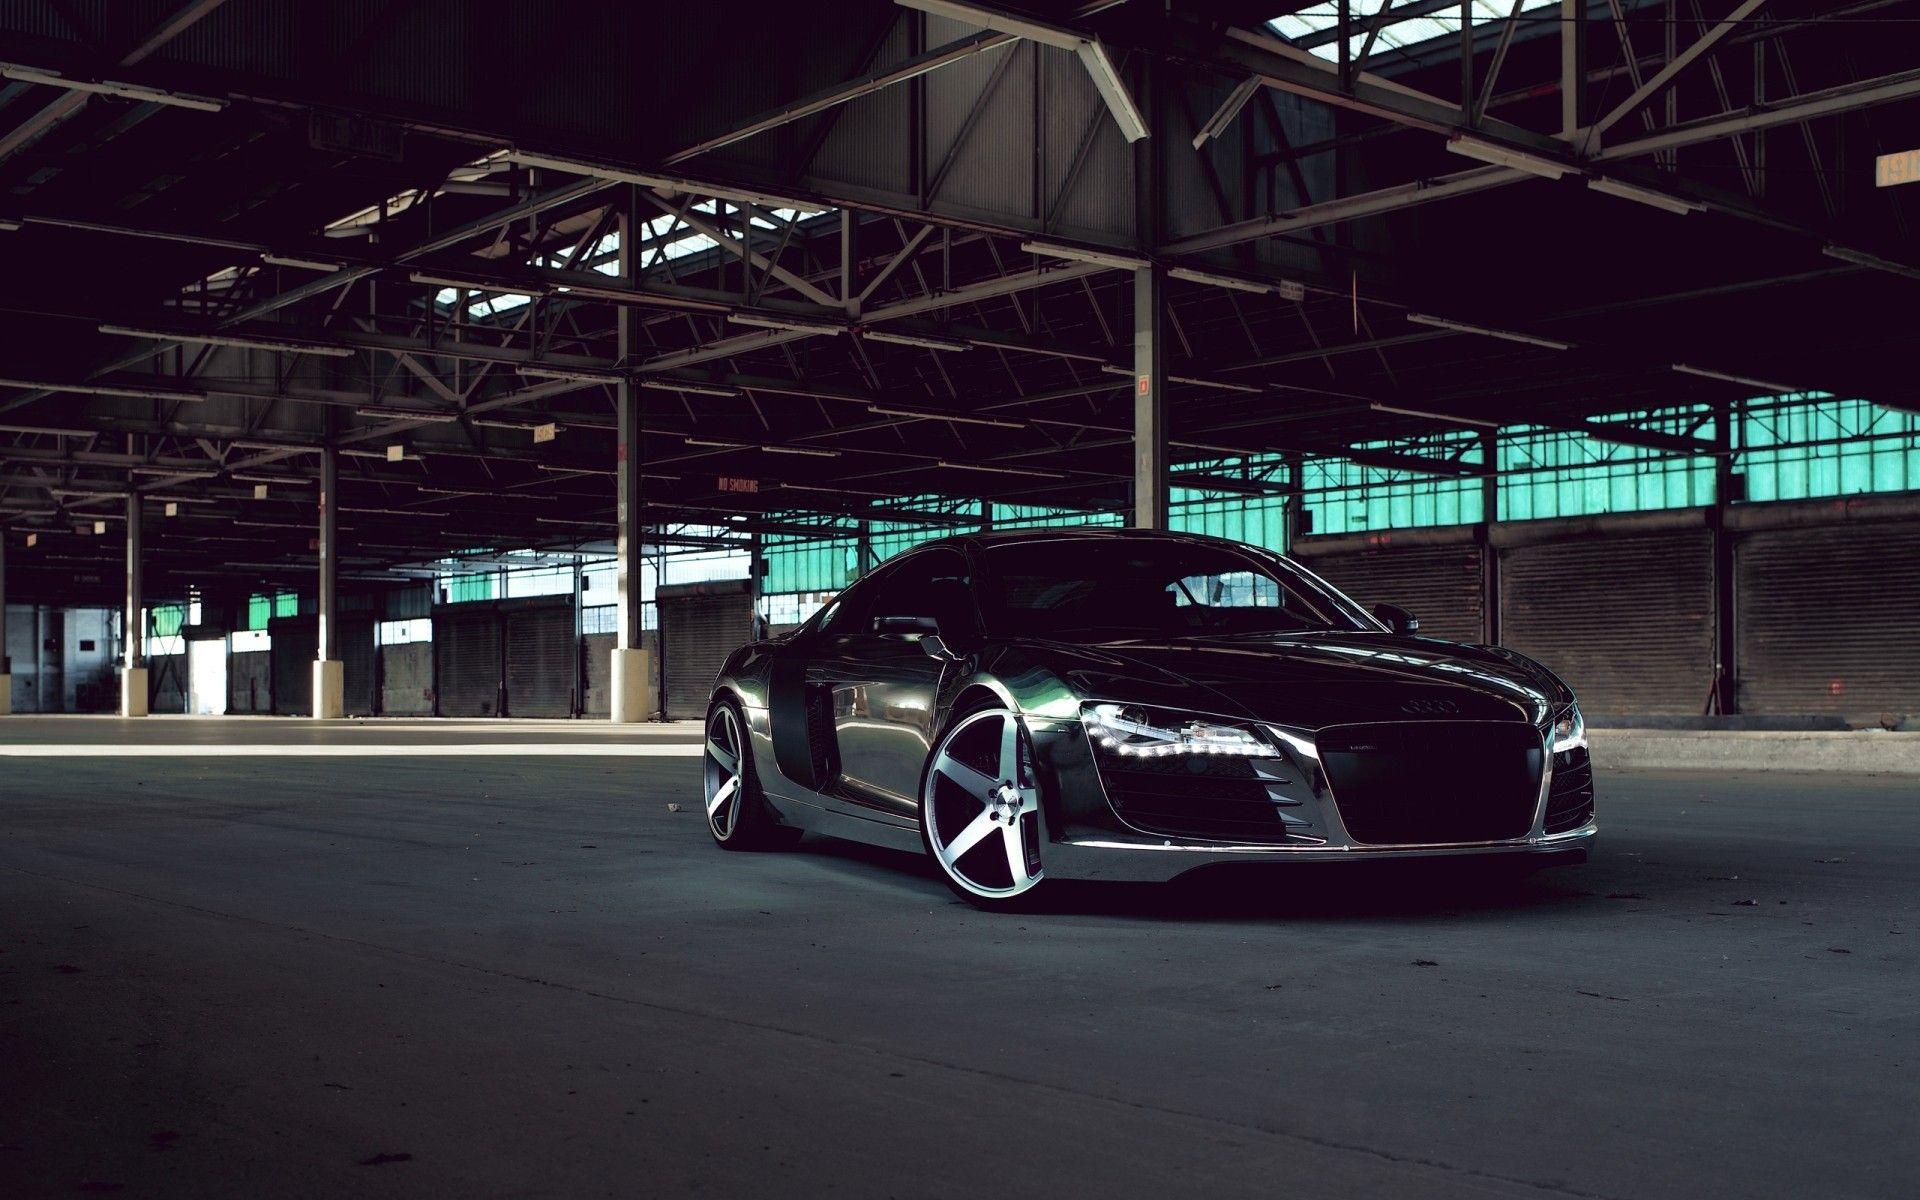 Audi R8 Car Audi Wallpaper Audi Audi R8 Audi R8 Matte Black